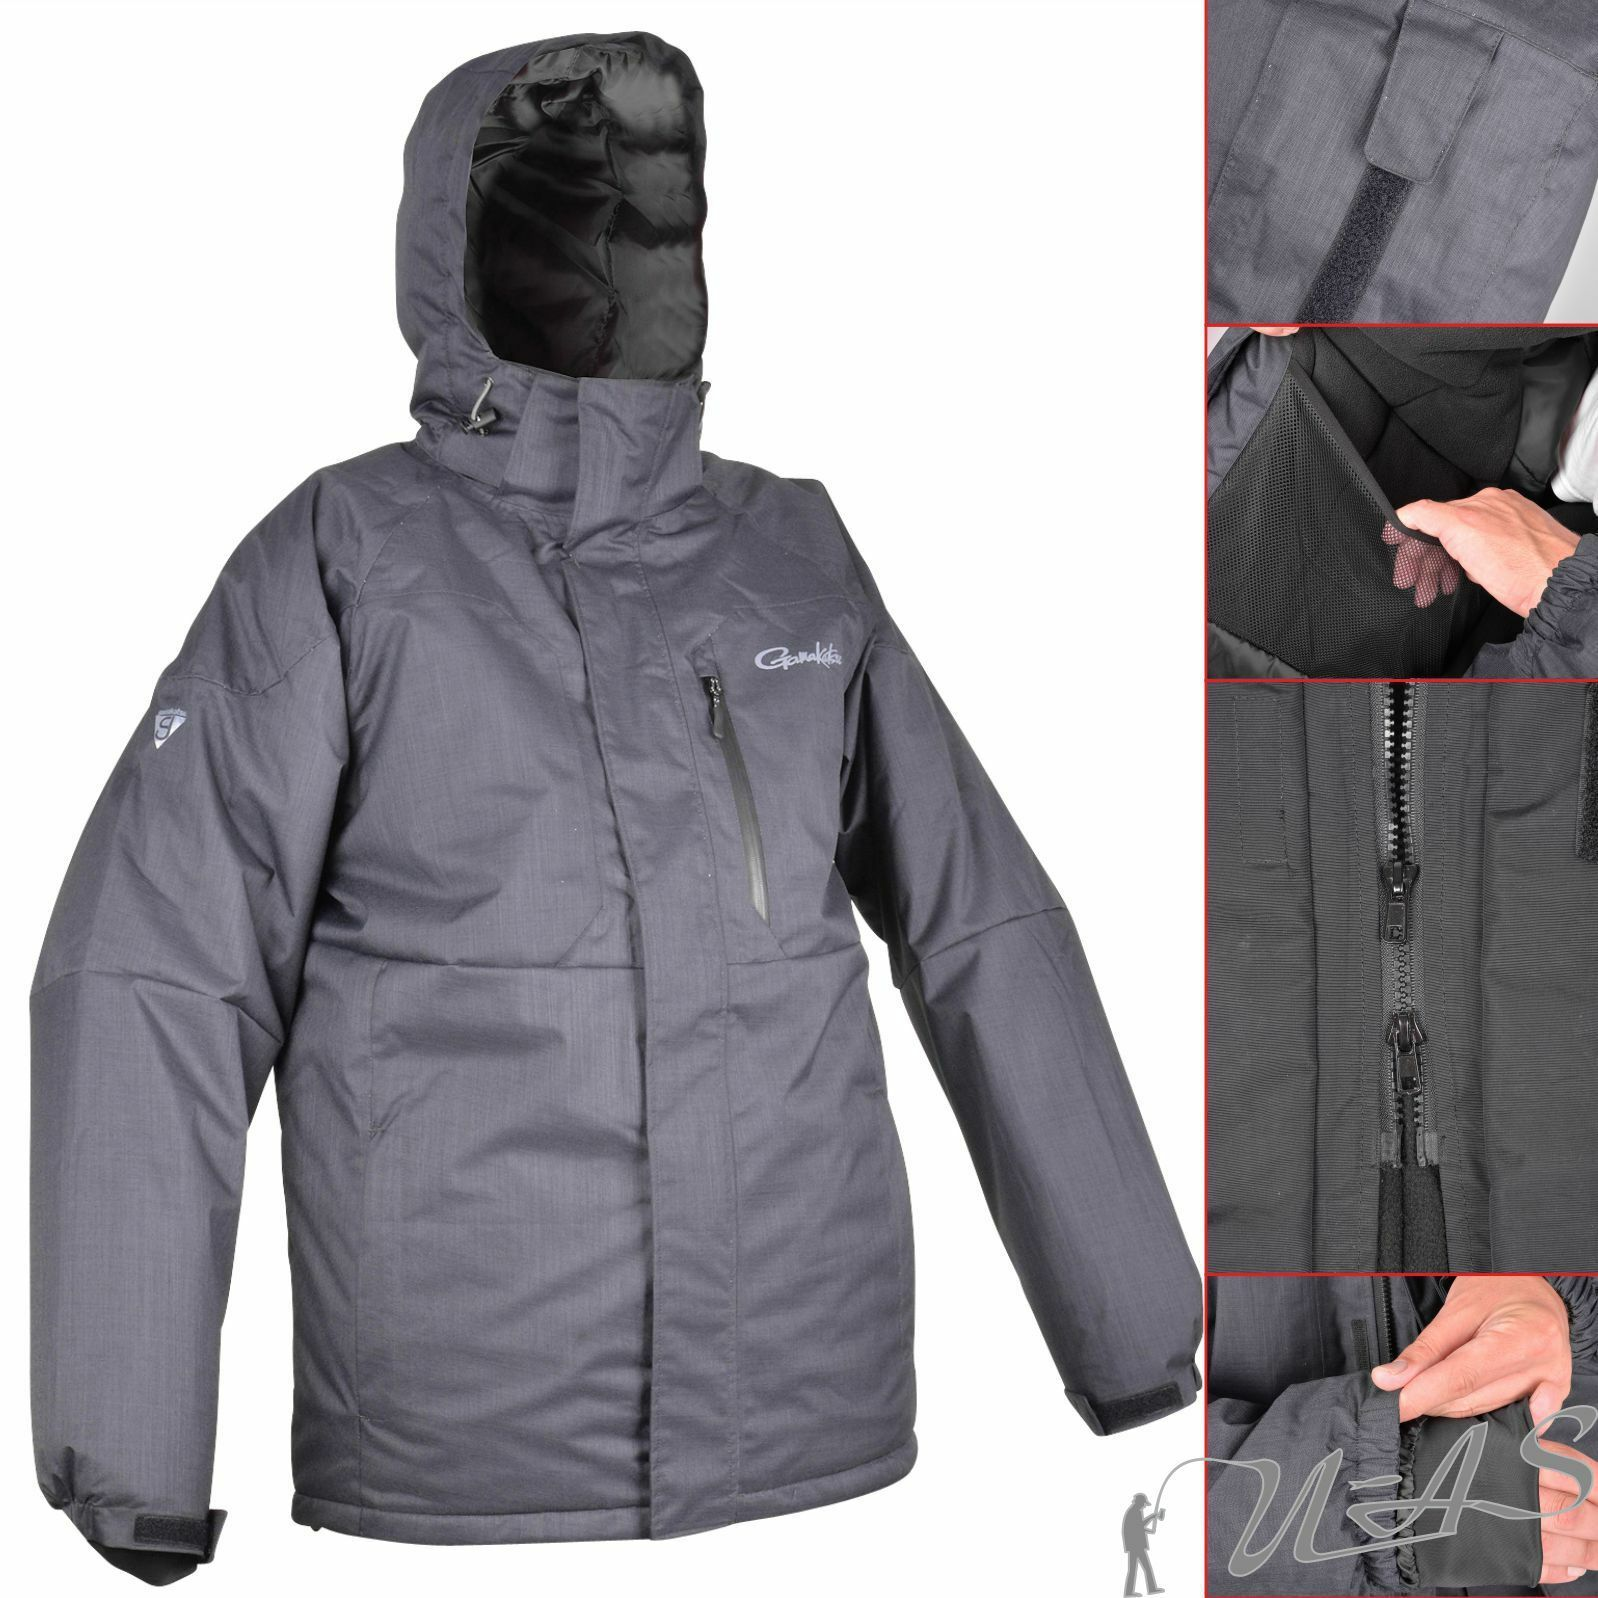 Gamakatsu Thermal Jacket Jacke Gr L Zu Thermoanzug Thermal Suits Angel Anzug Sha